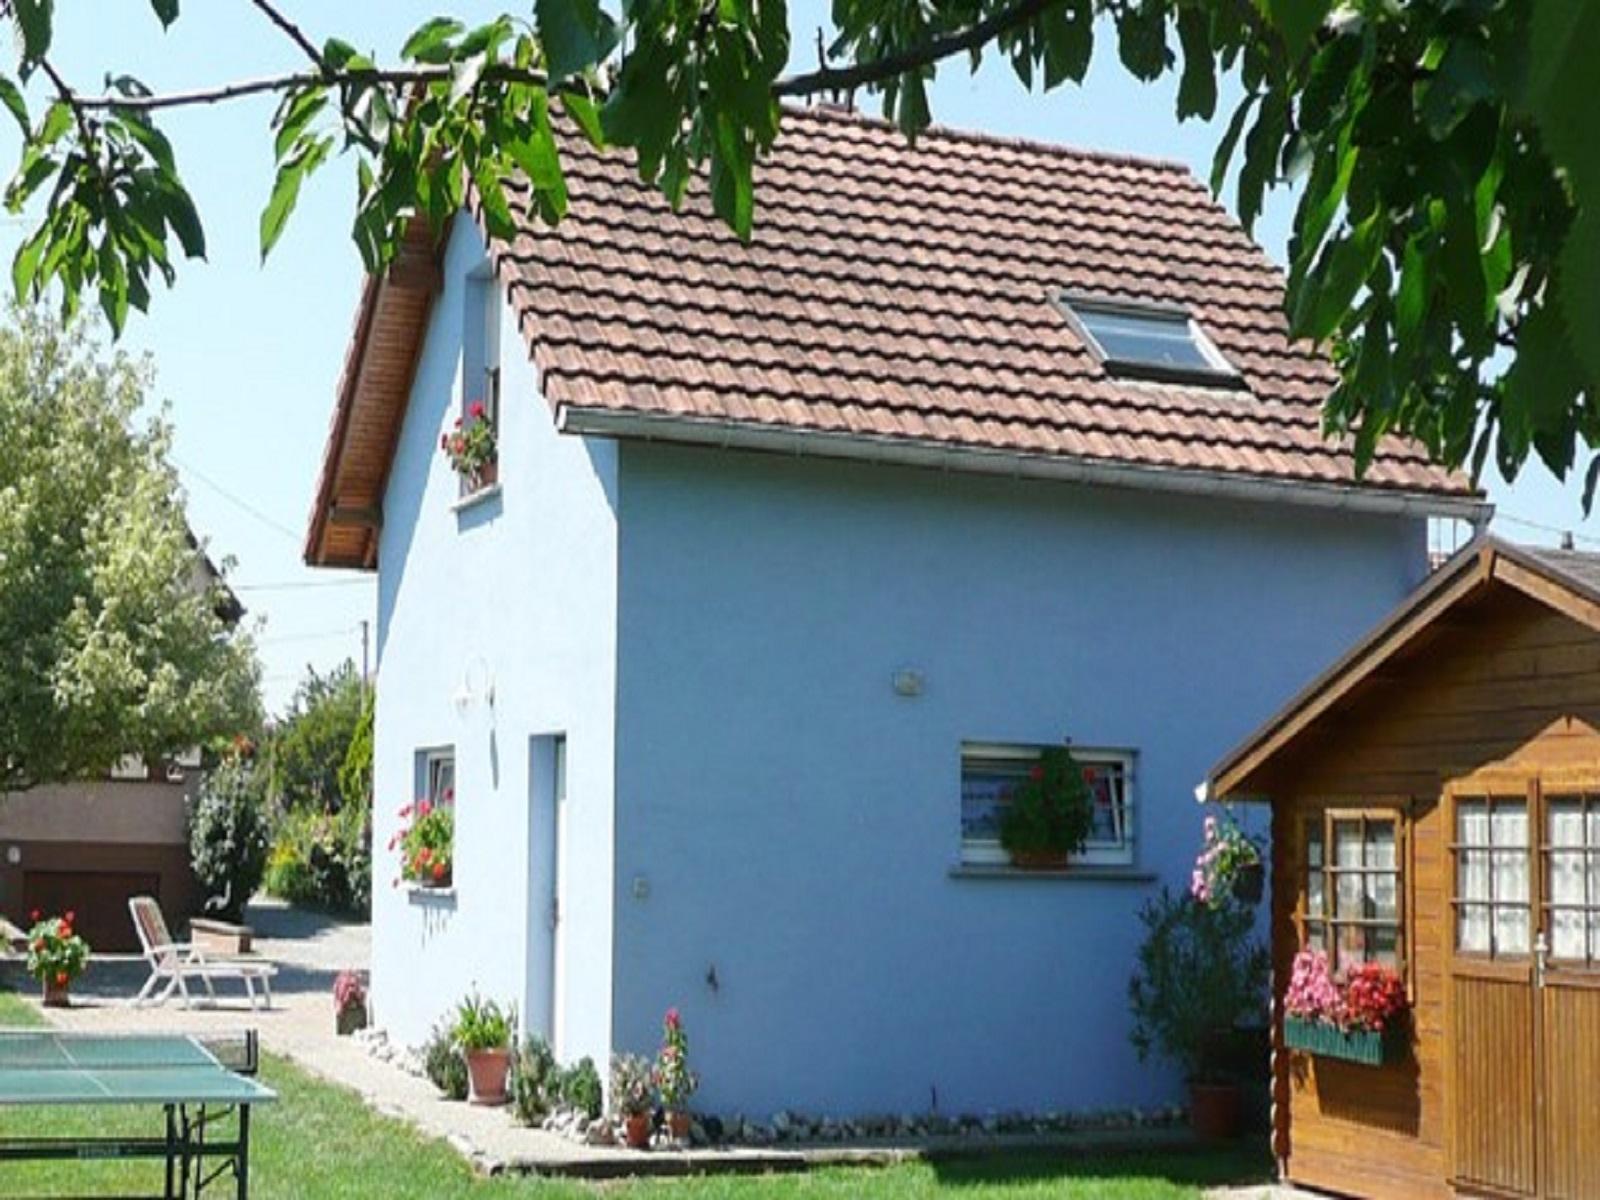 Meublé Christian Montalbetti, Oberhergheim, Haut-Rhin, Alsace Terrasse + parking privé dans la propriété